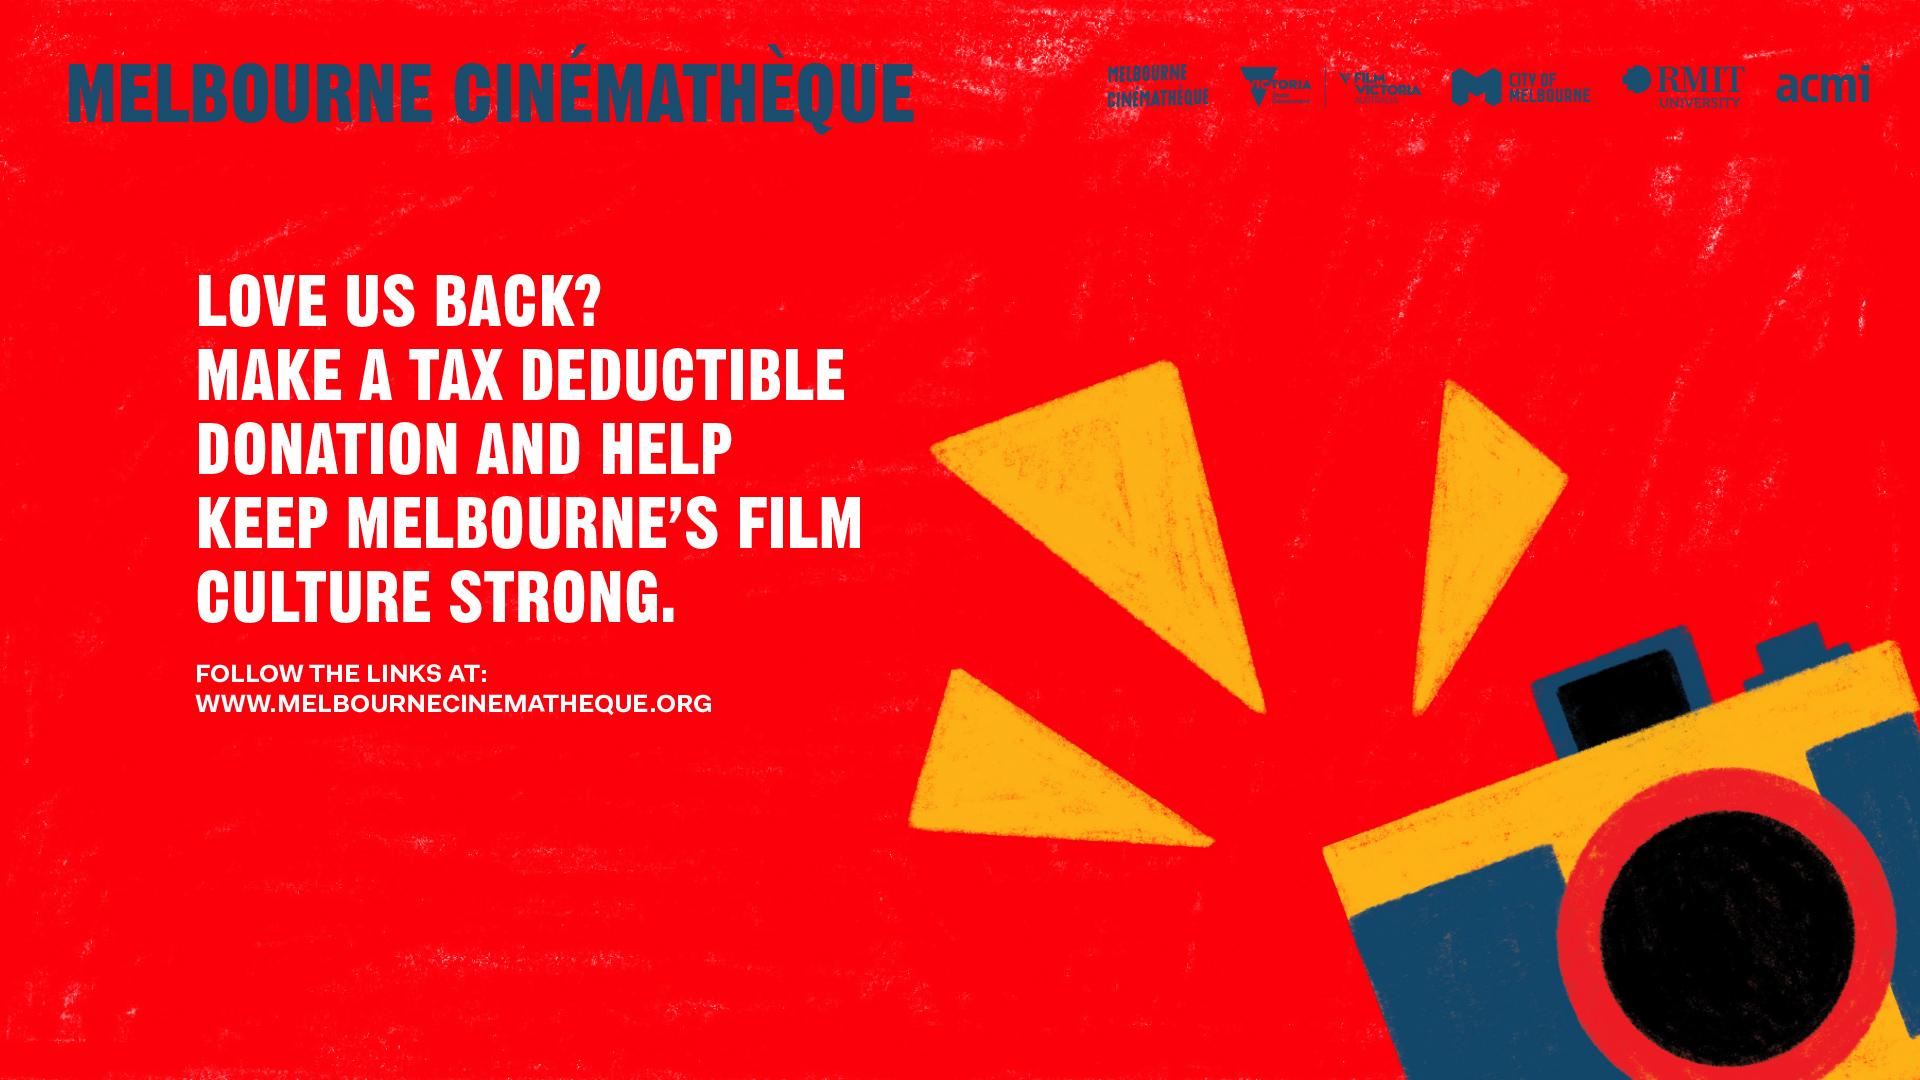 cinematheque-2019-slides-FA-loveus-1.jpg